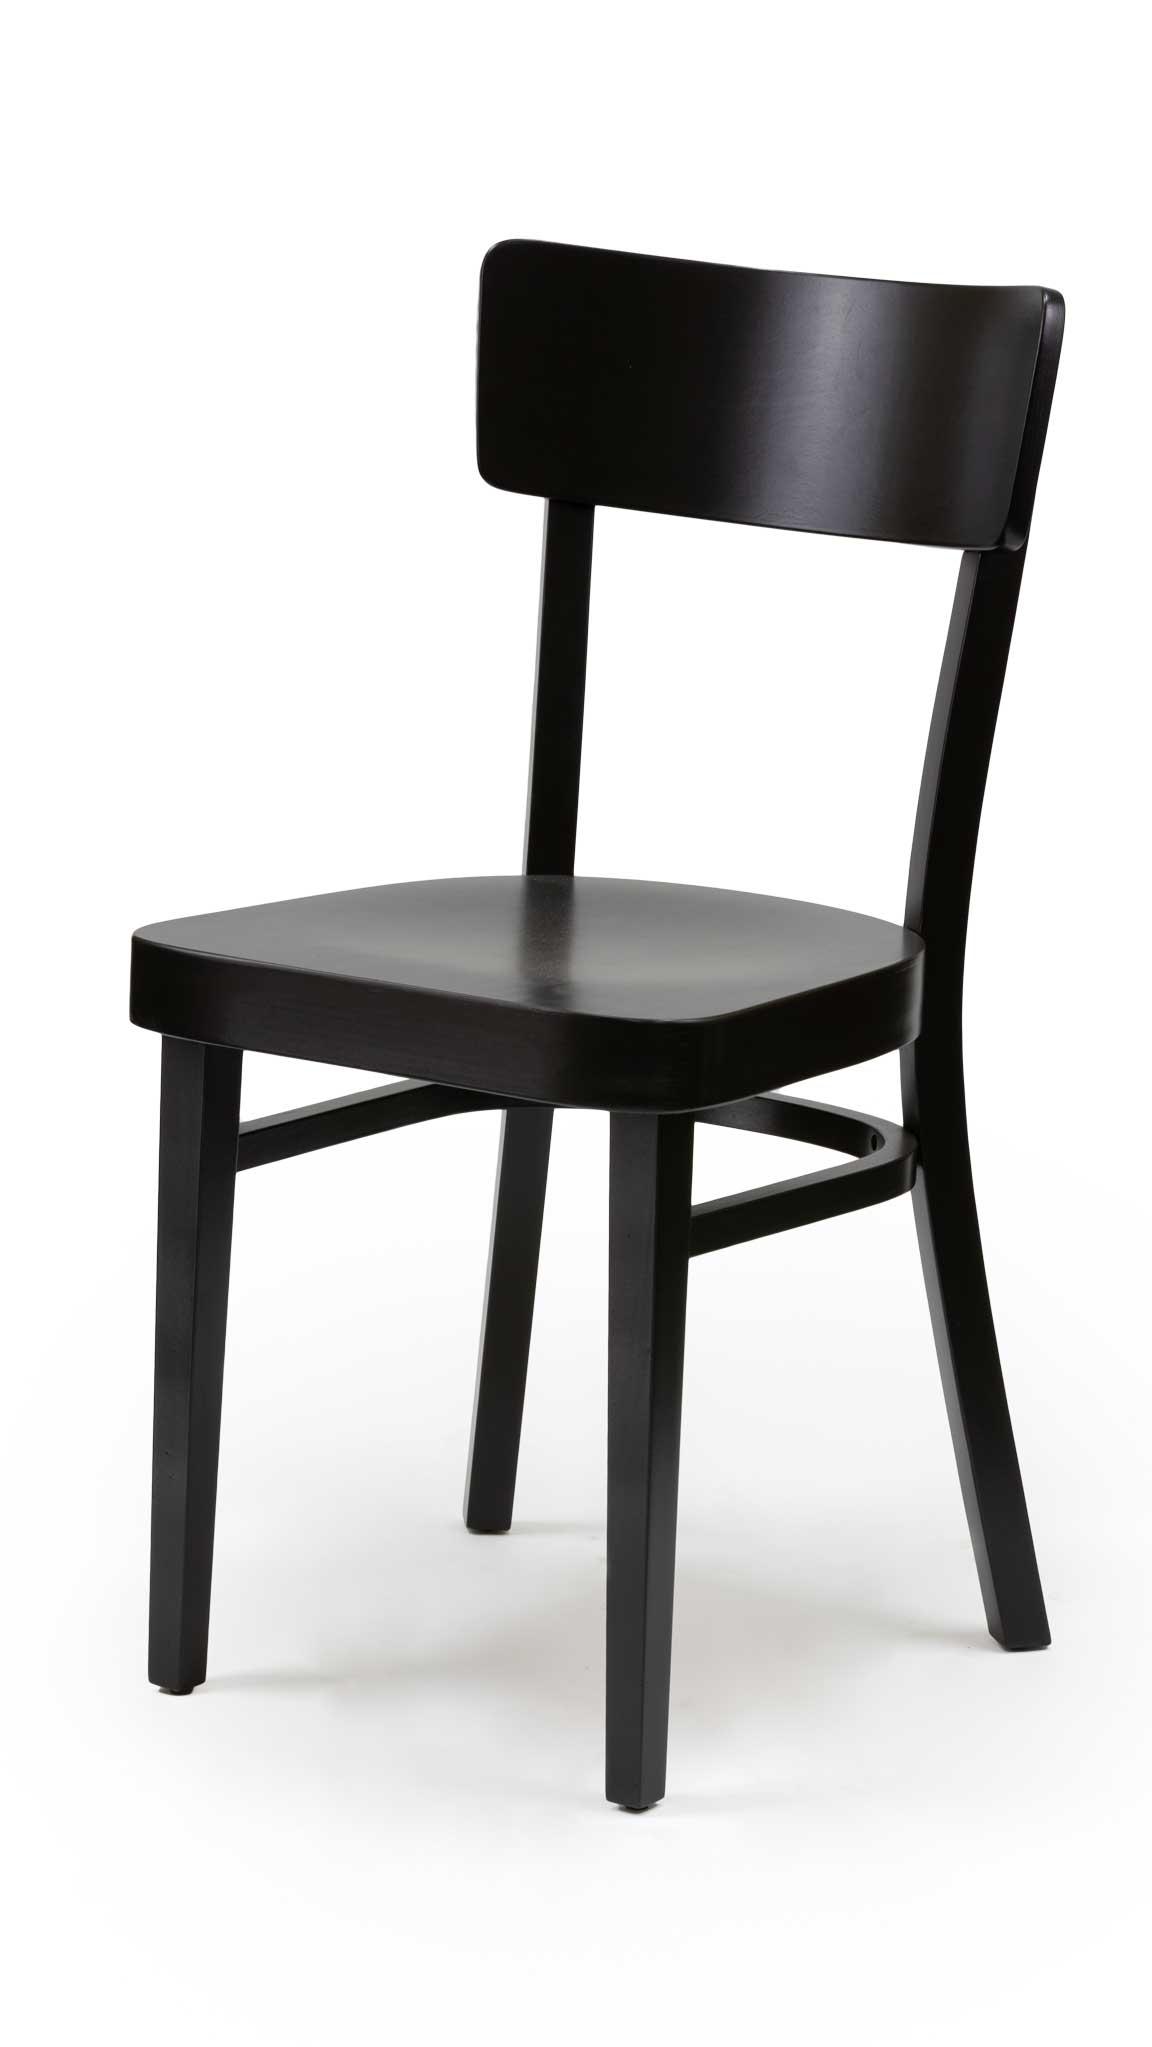 Черен стол от масив бук - 1310S